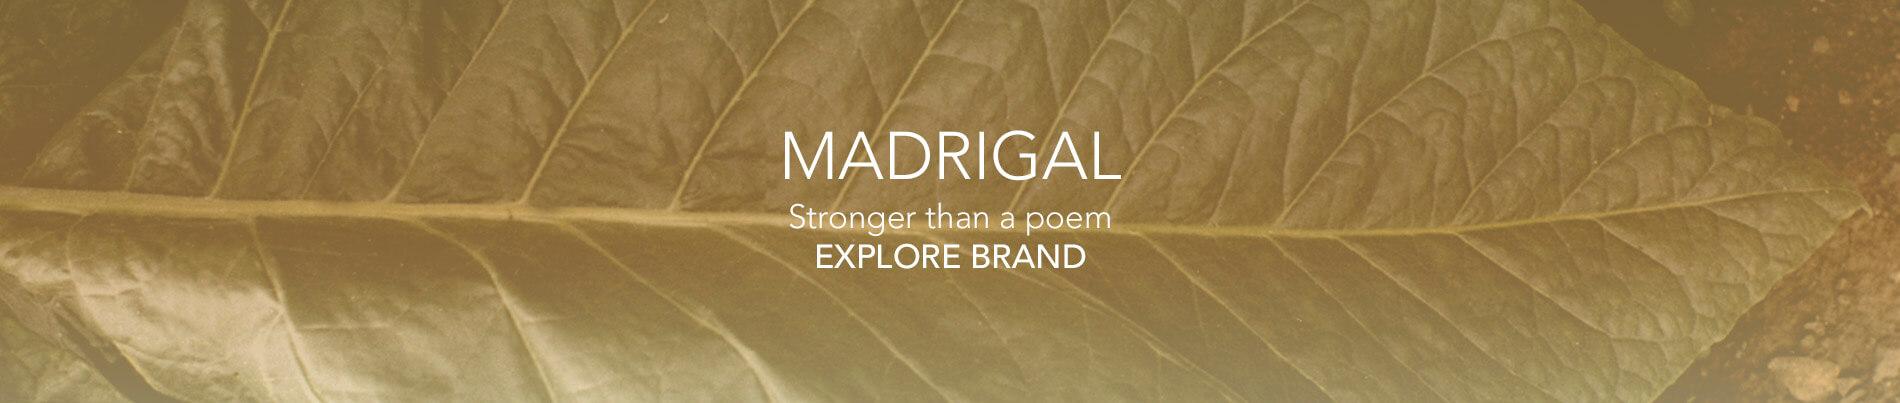 banner-madrigal